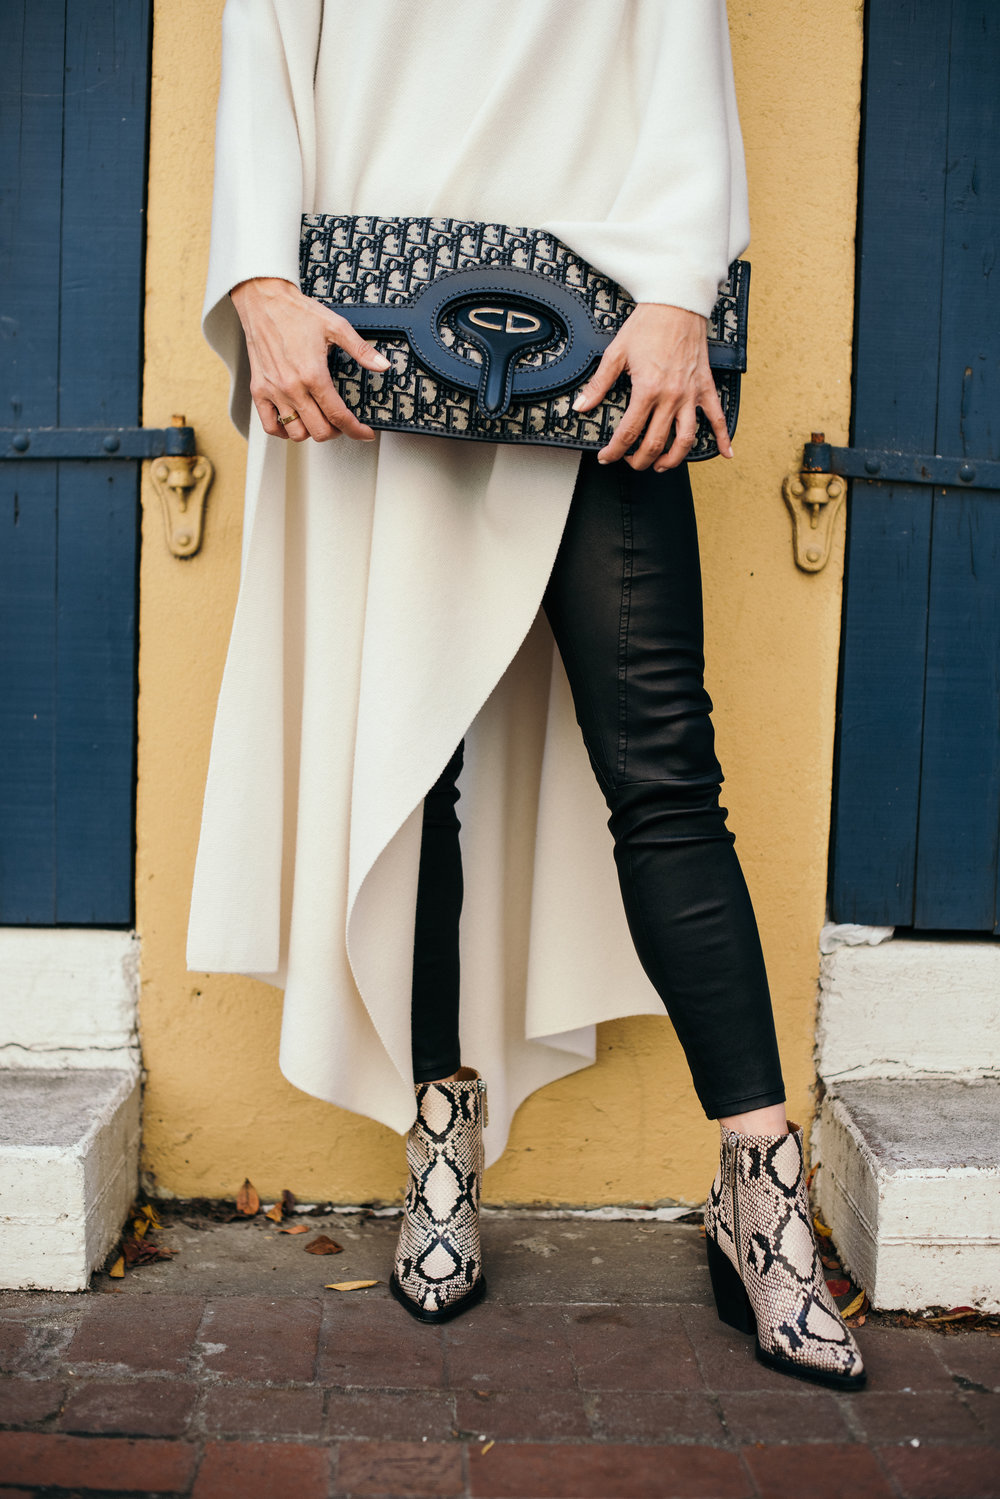 poncho: chloe, bag: dior, boots: chloe, pants: helmut lang